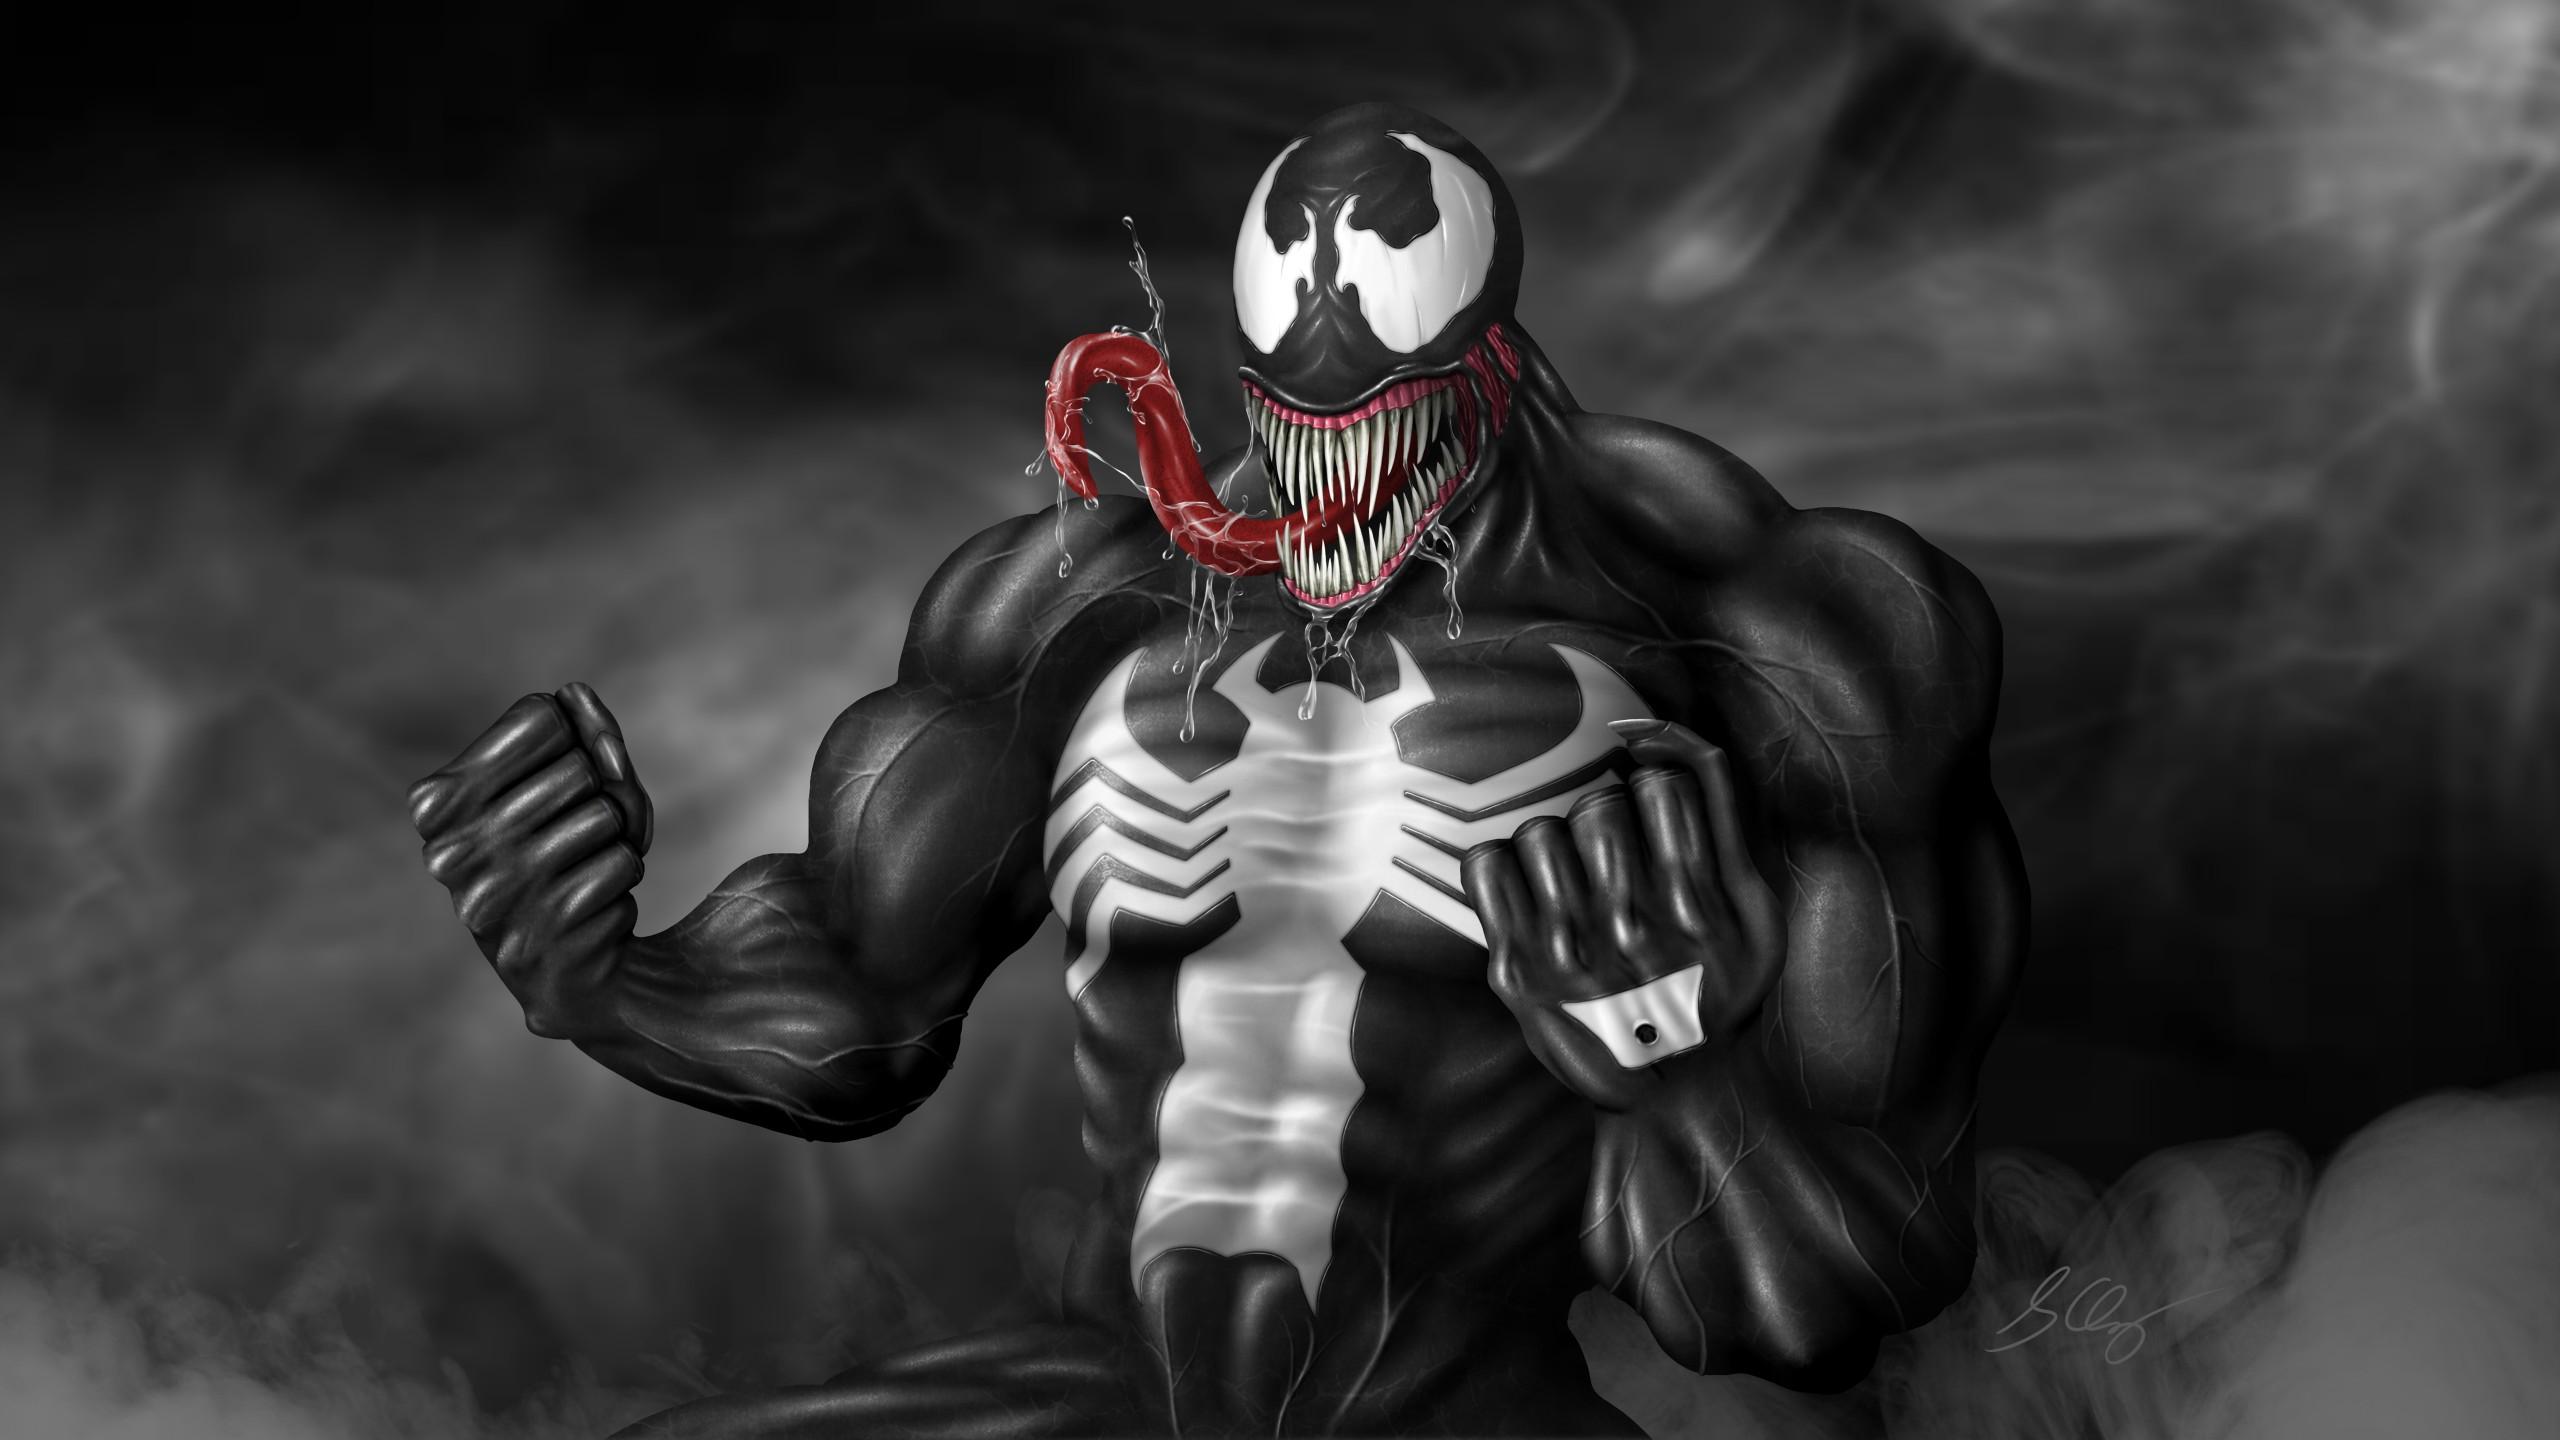 Spiderman 3d Wallpaper For Iphone Venom Artwork 5k Wallpapers Hd Wallpapers Id 25963